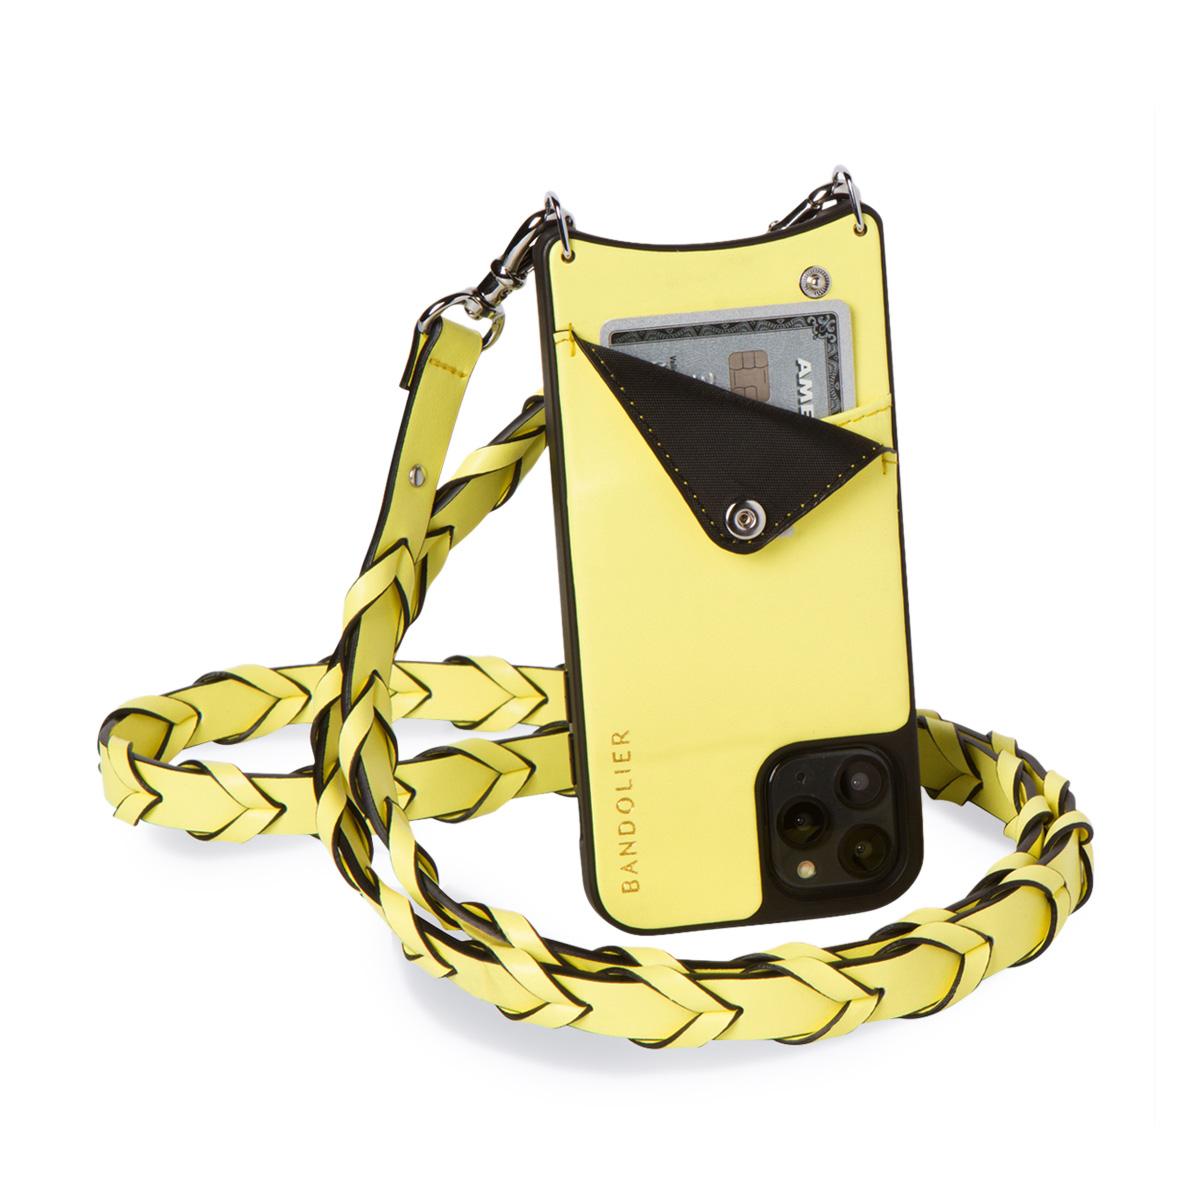 BANDOLIER ZOEY YELLOW バンドリヤー iPhone XR ケース スマホ 携帯 ショルダー アイフォン メンズ レディース レザー イエロー 10ZOE